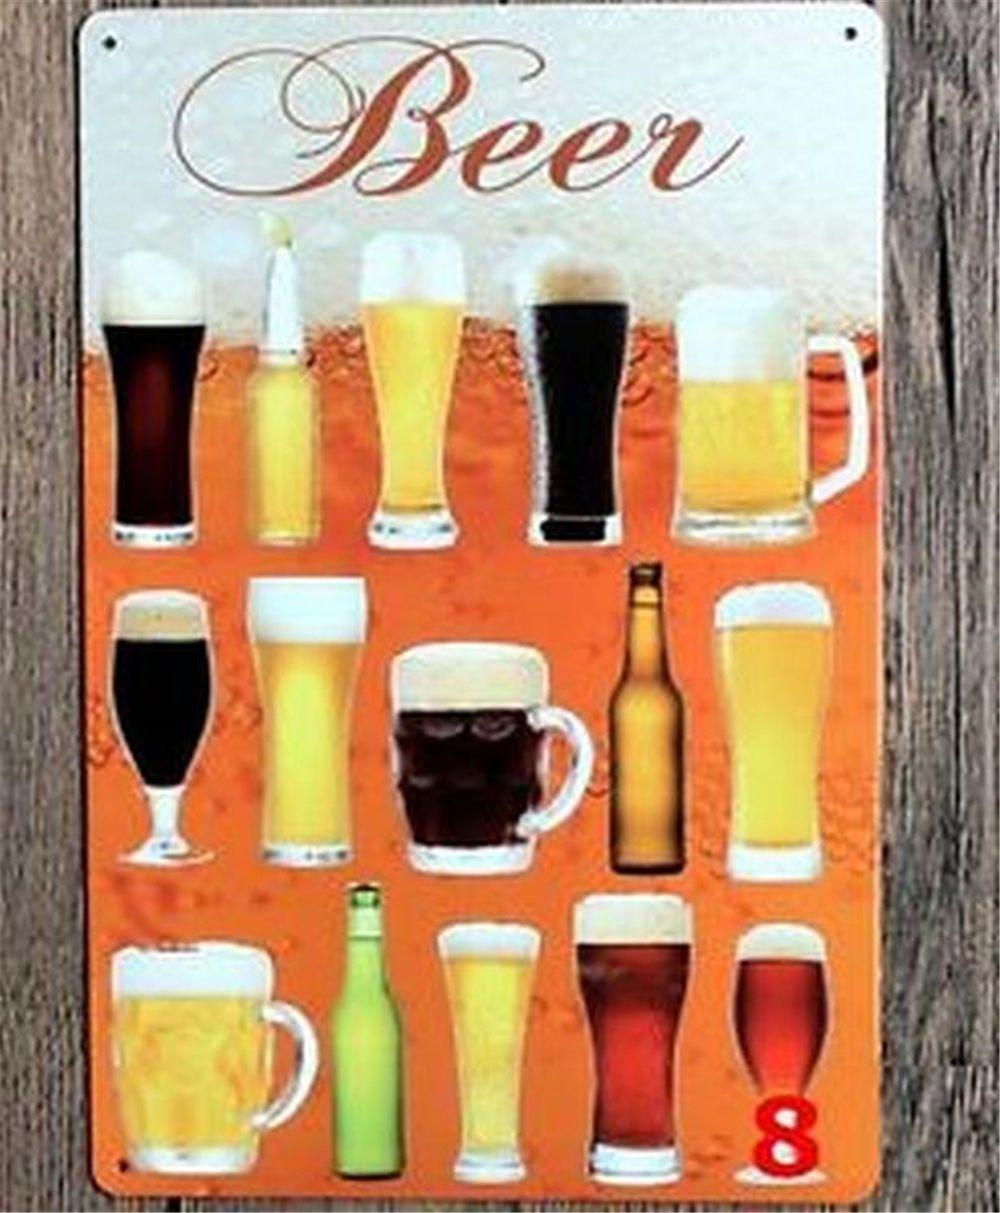 Bar Beer Mugs metal wall art sign